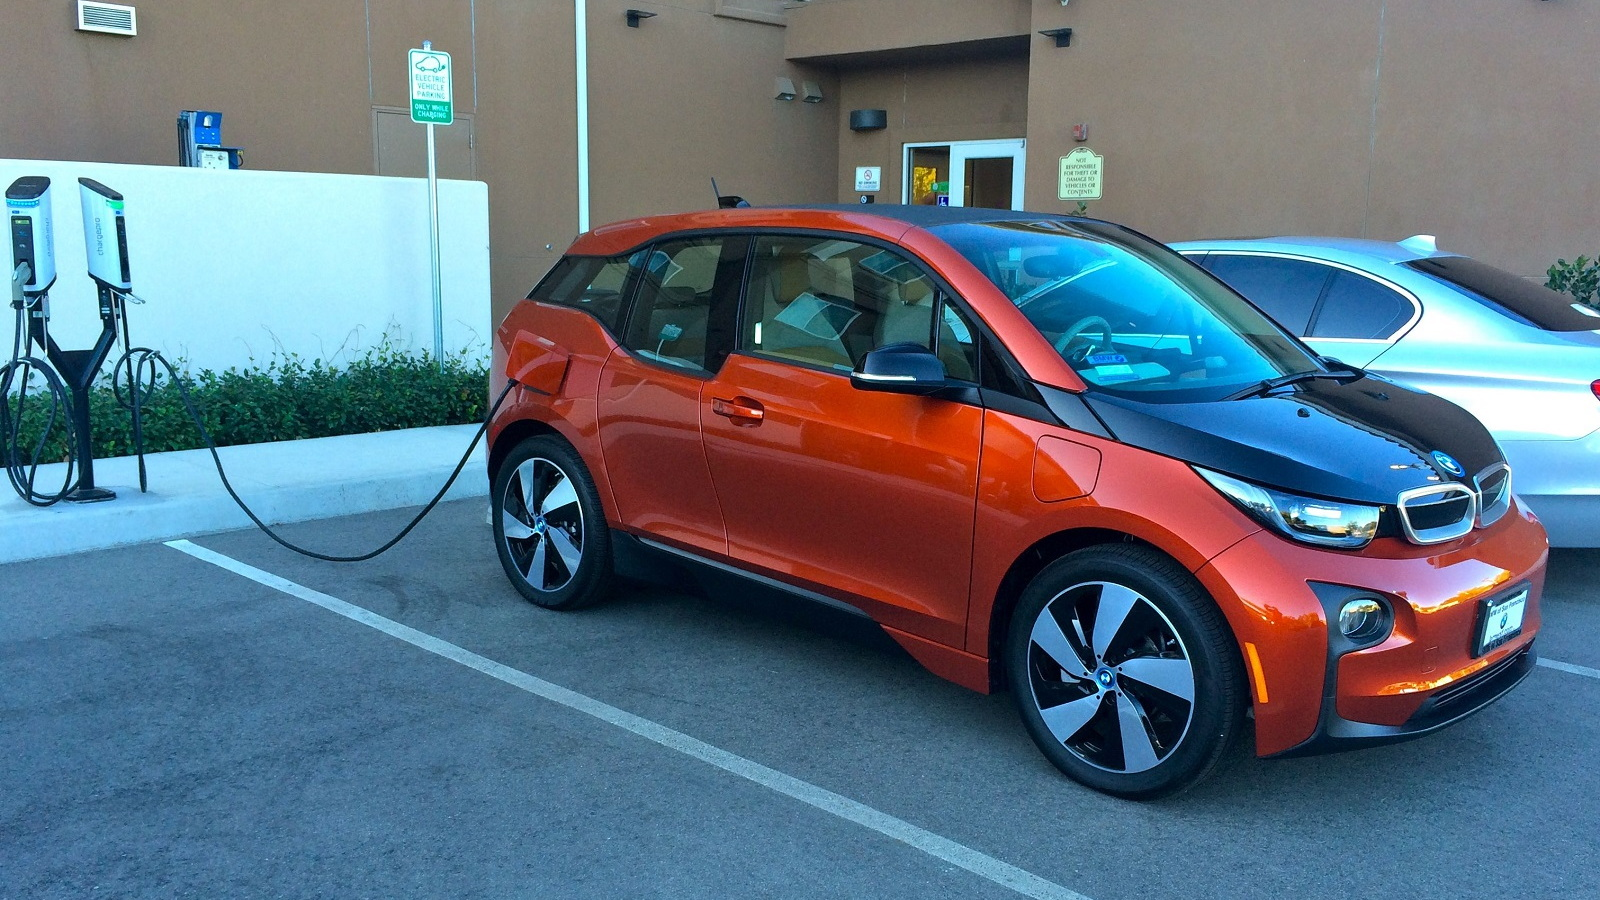 2015 BMW i3 REx charging at The Oaks Hotel, Paso Robles, California   [photo: Jeff Pantukhoff]